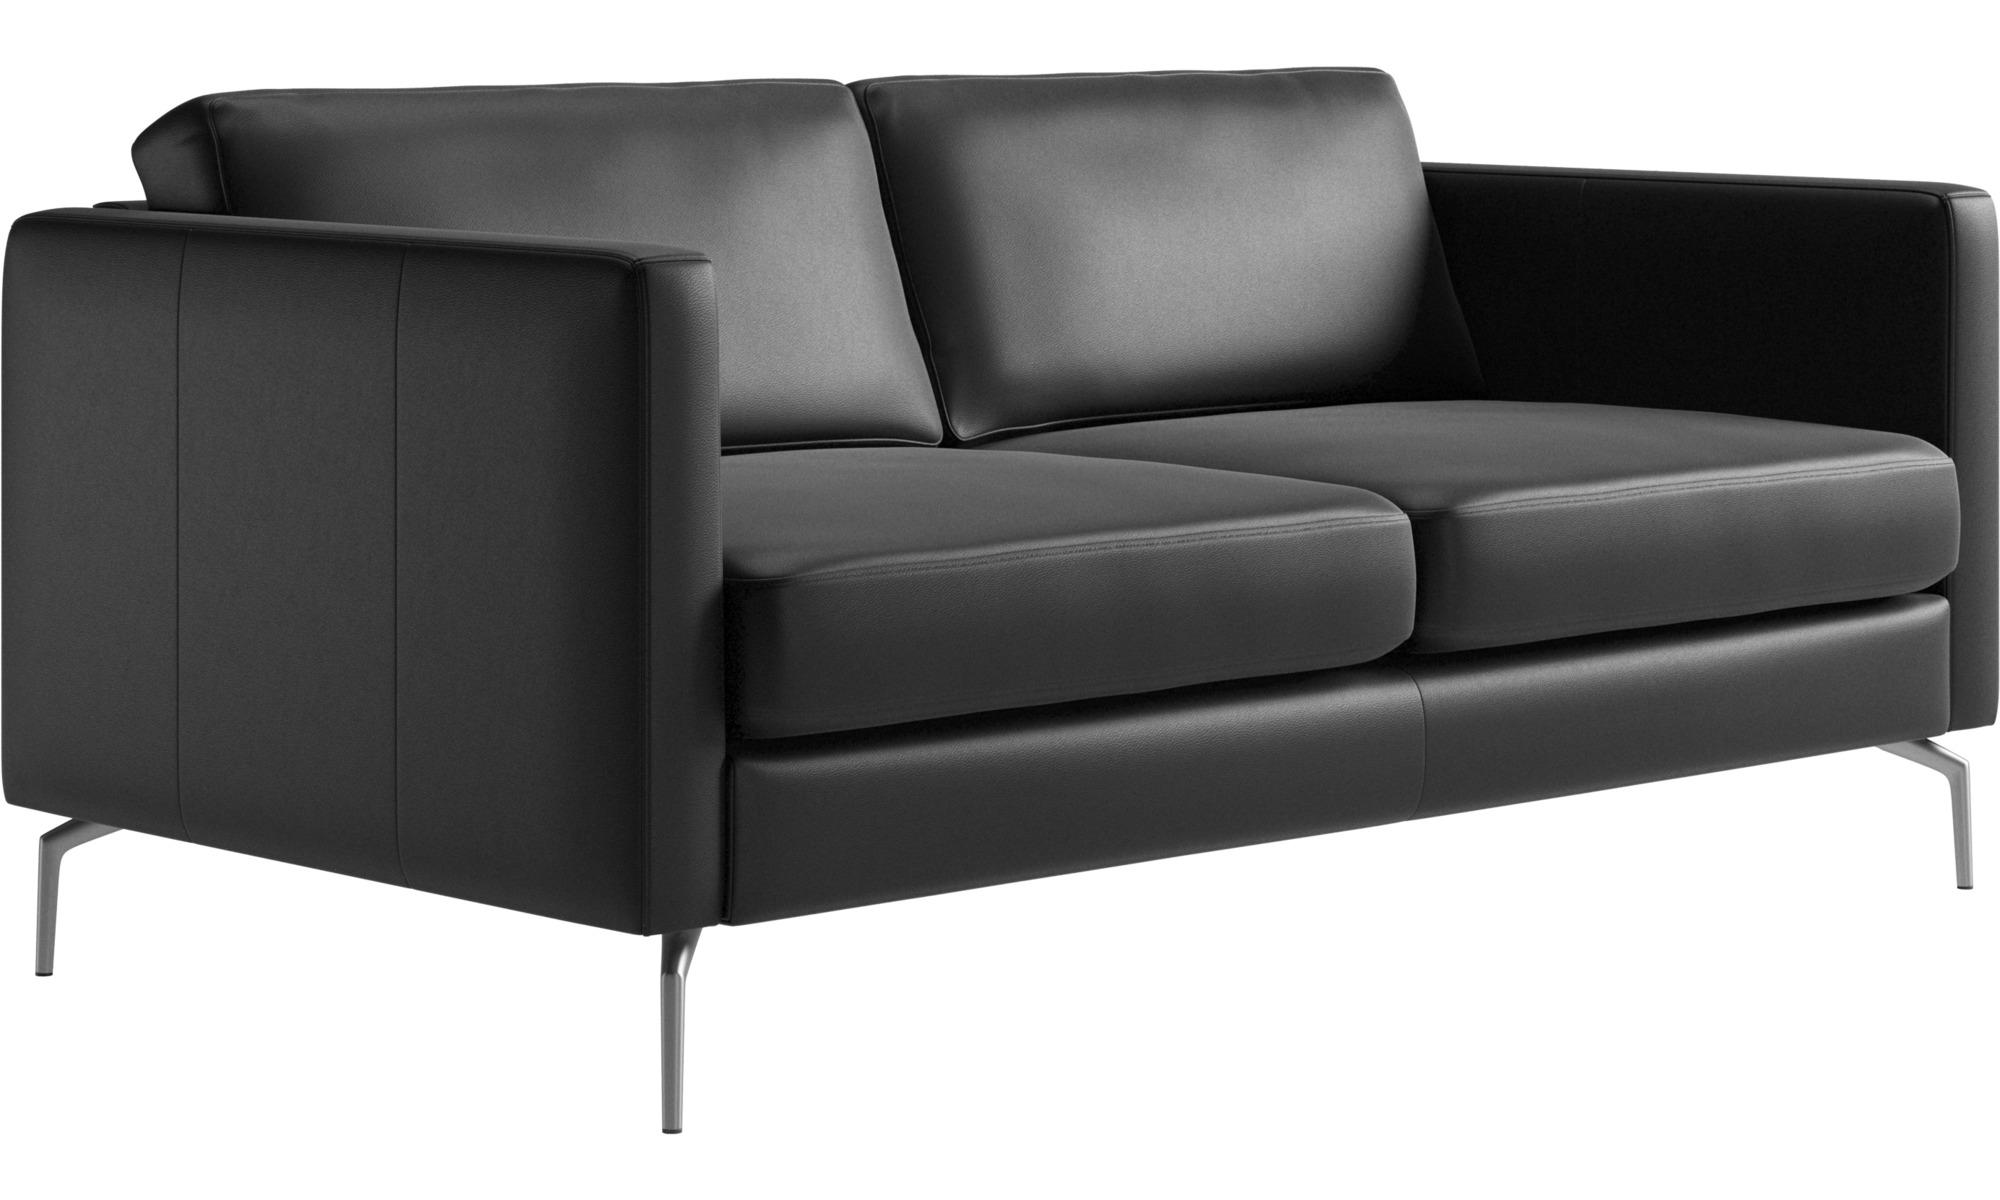 2 Seater Sofas Osaka Sofa Regular Seat Black Leather